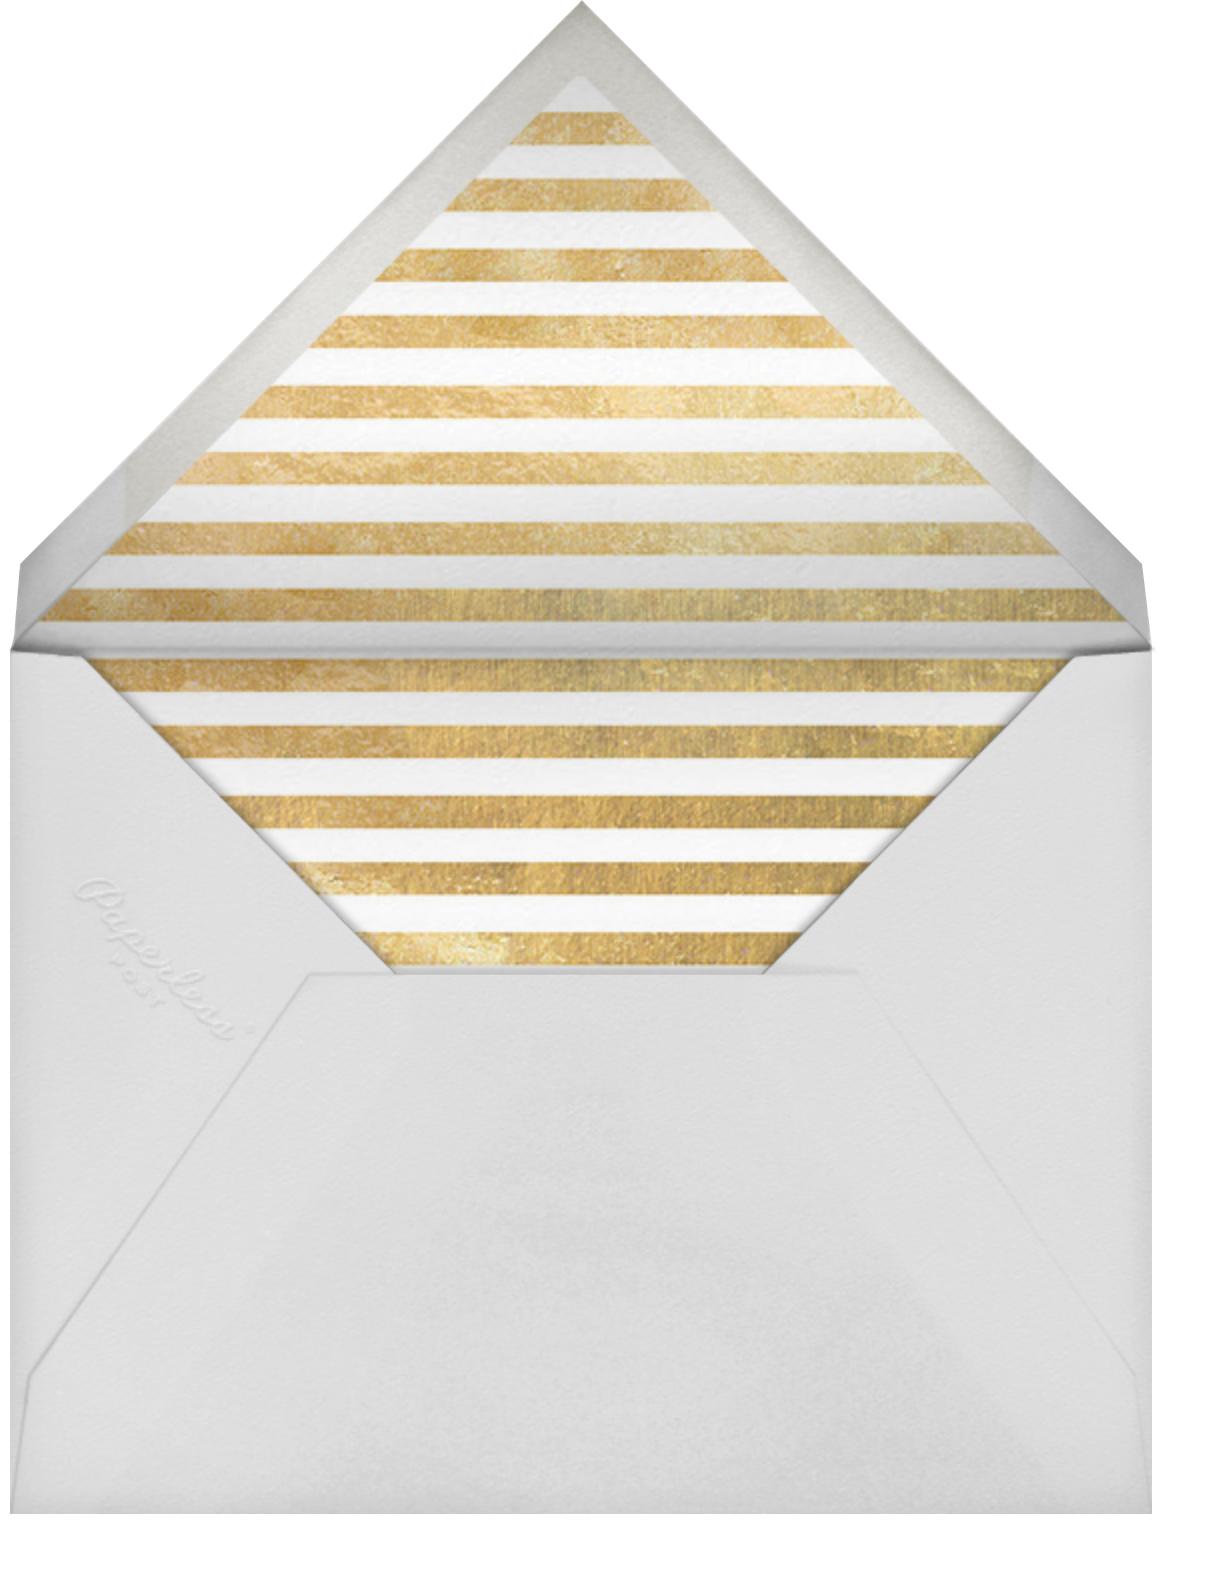 Confetti (Invitation) - White/Gold - kate spade new york - All - envelope back